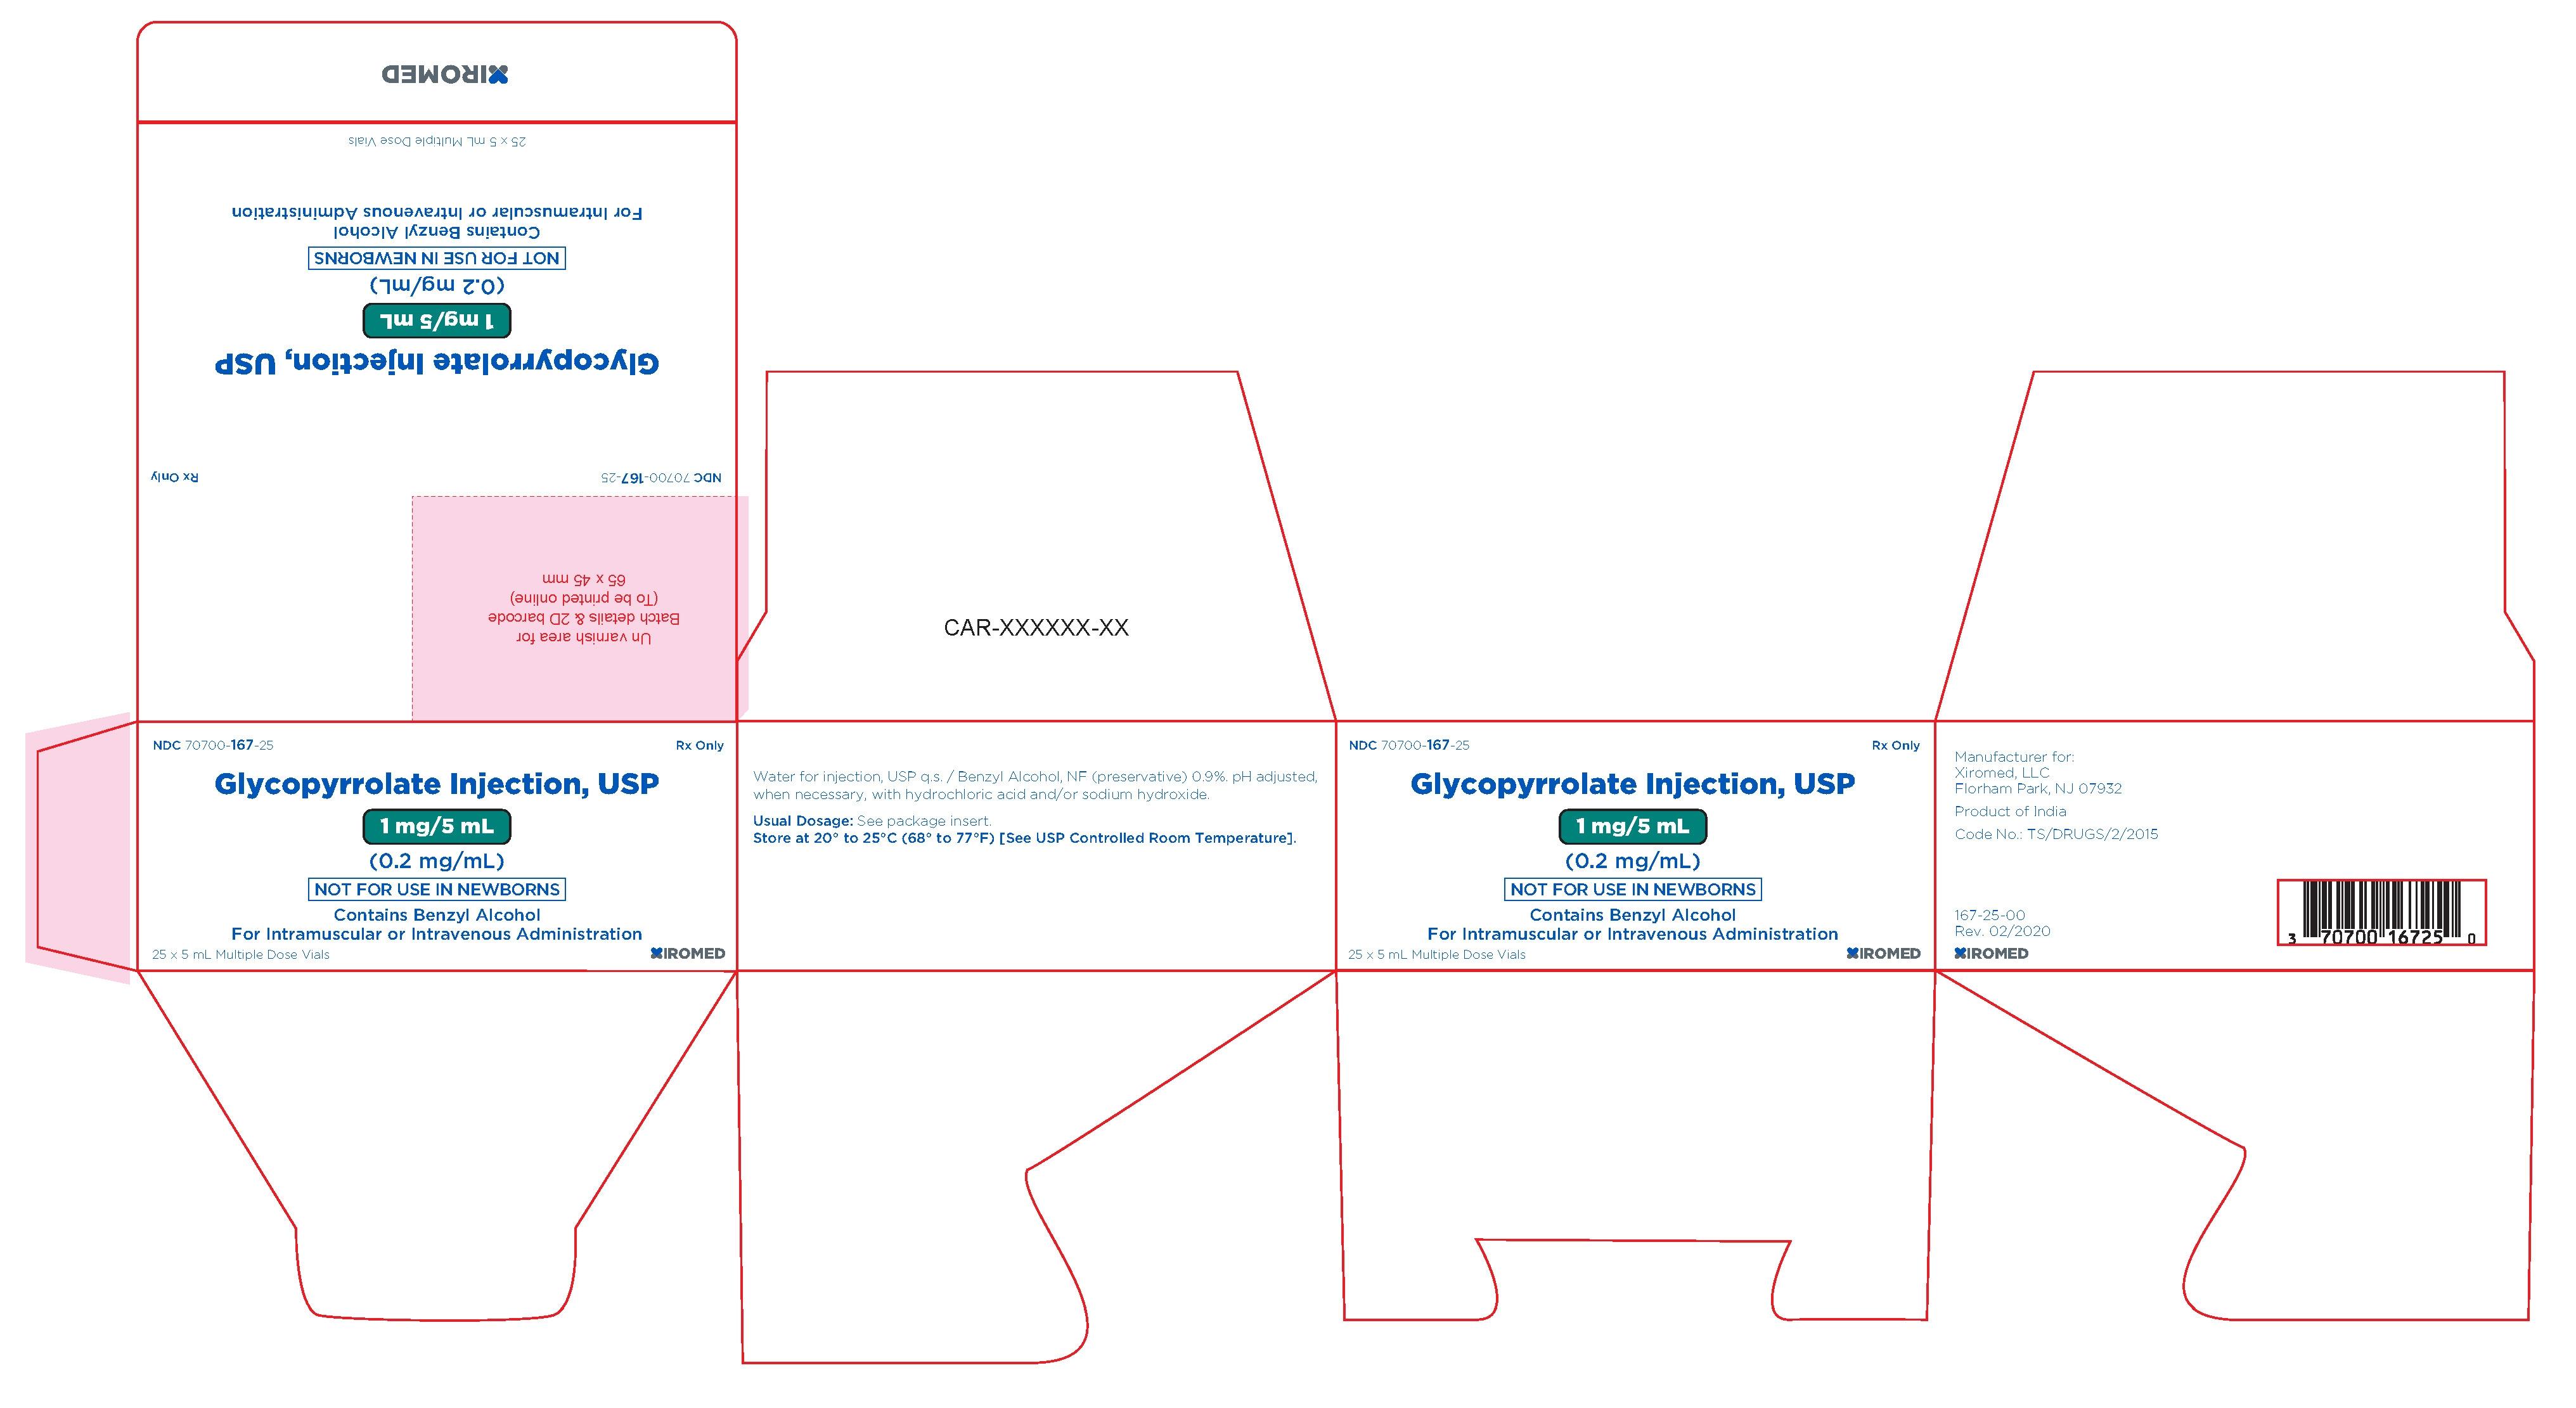 glycopyrrolate-spl-5ml-carton-label